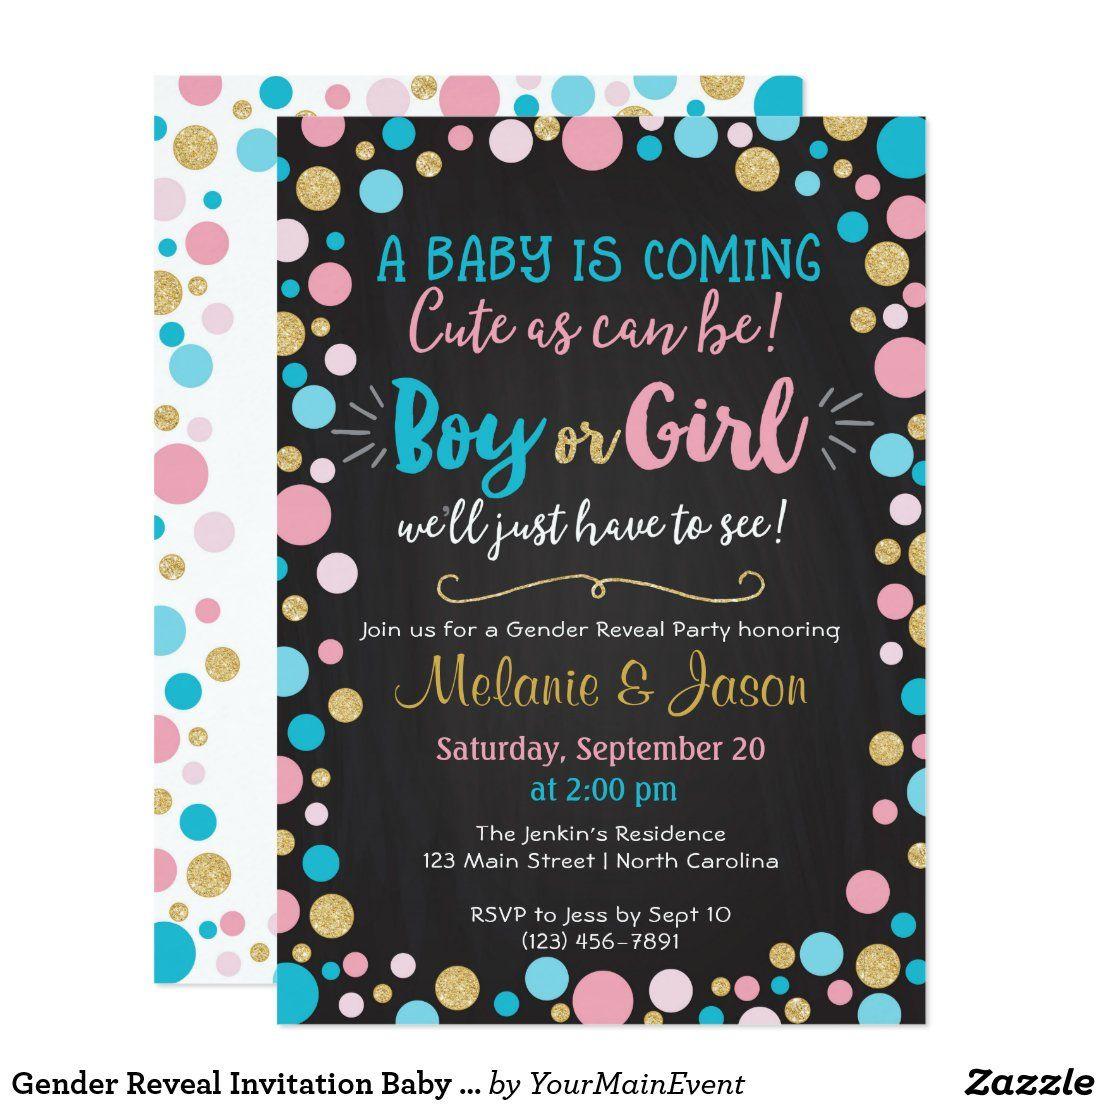 Gender Reveal Invitation Baby Shower Boy Or Girl Zazzle Com Gender Reveal Invitations Gender Reveal Party Invitations Gender Reveal Invitations Template